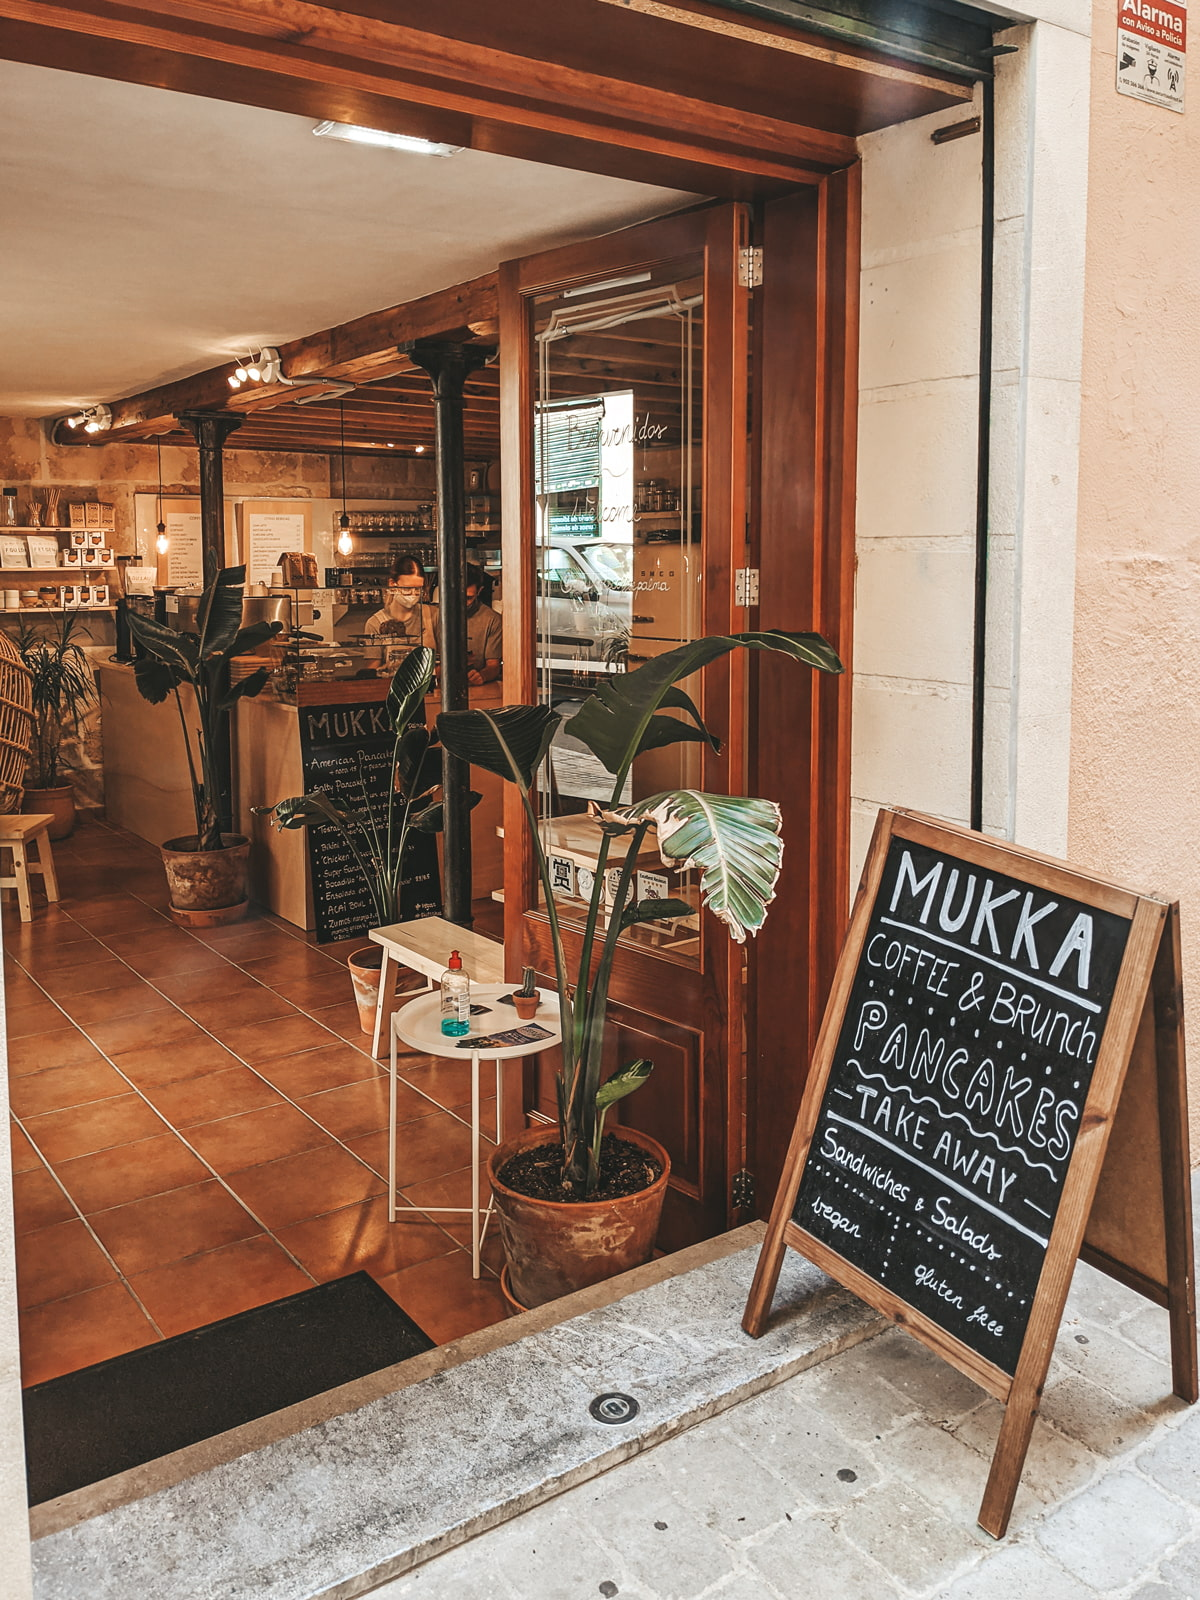 Mukka Coffee